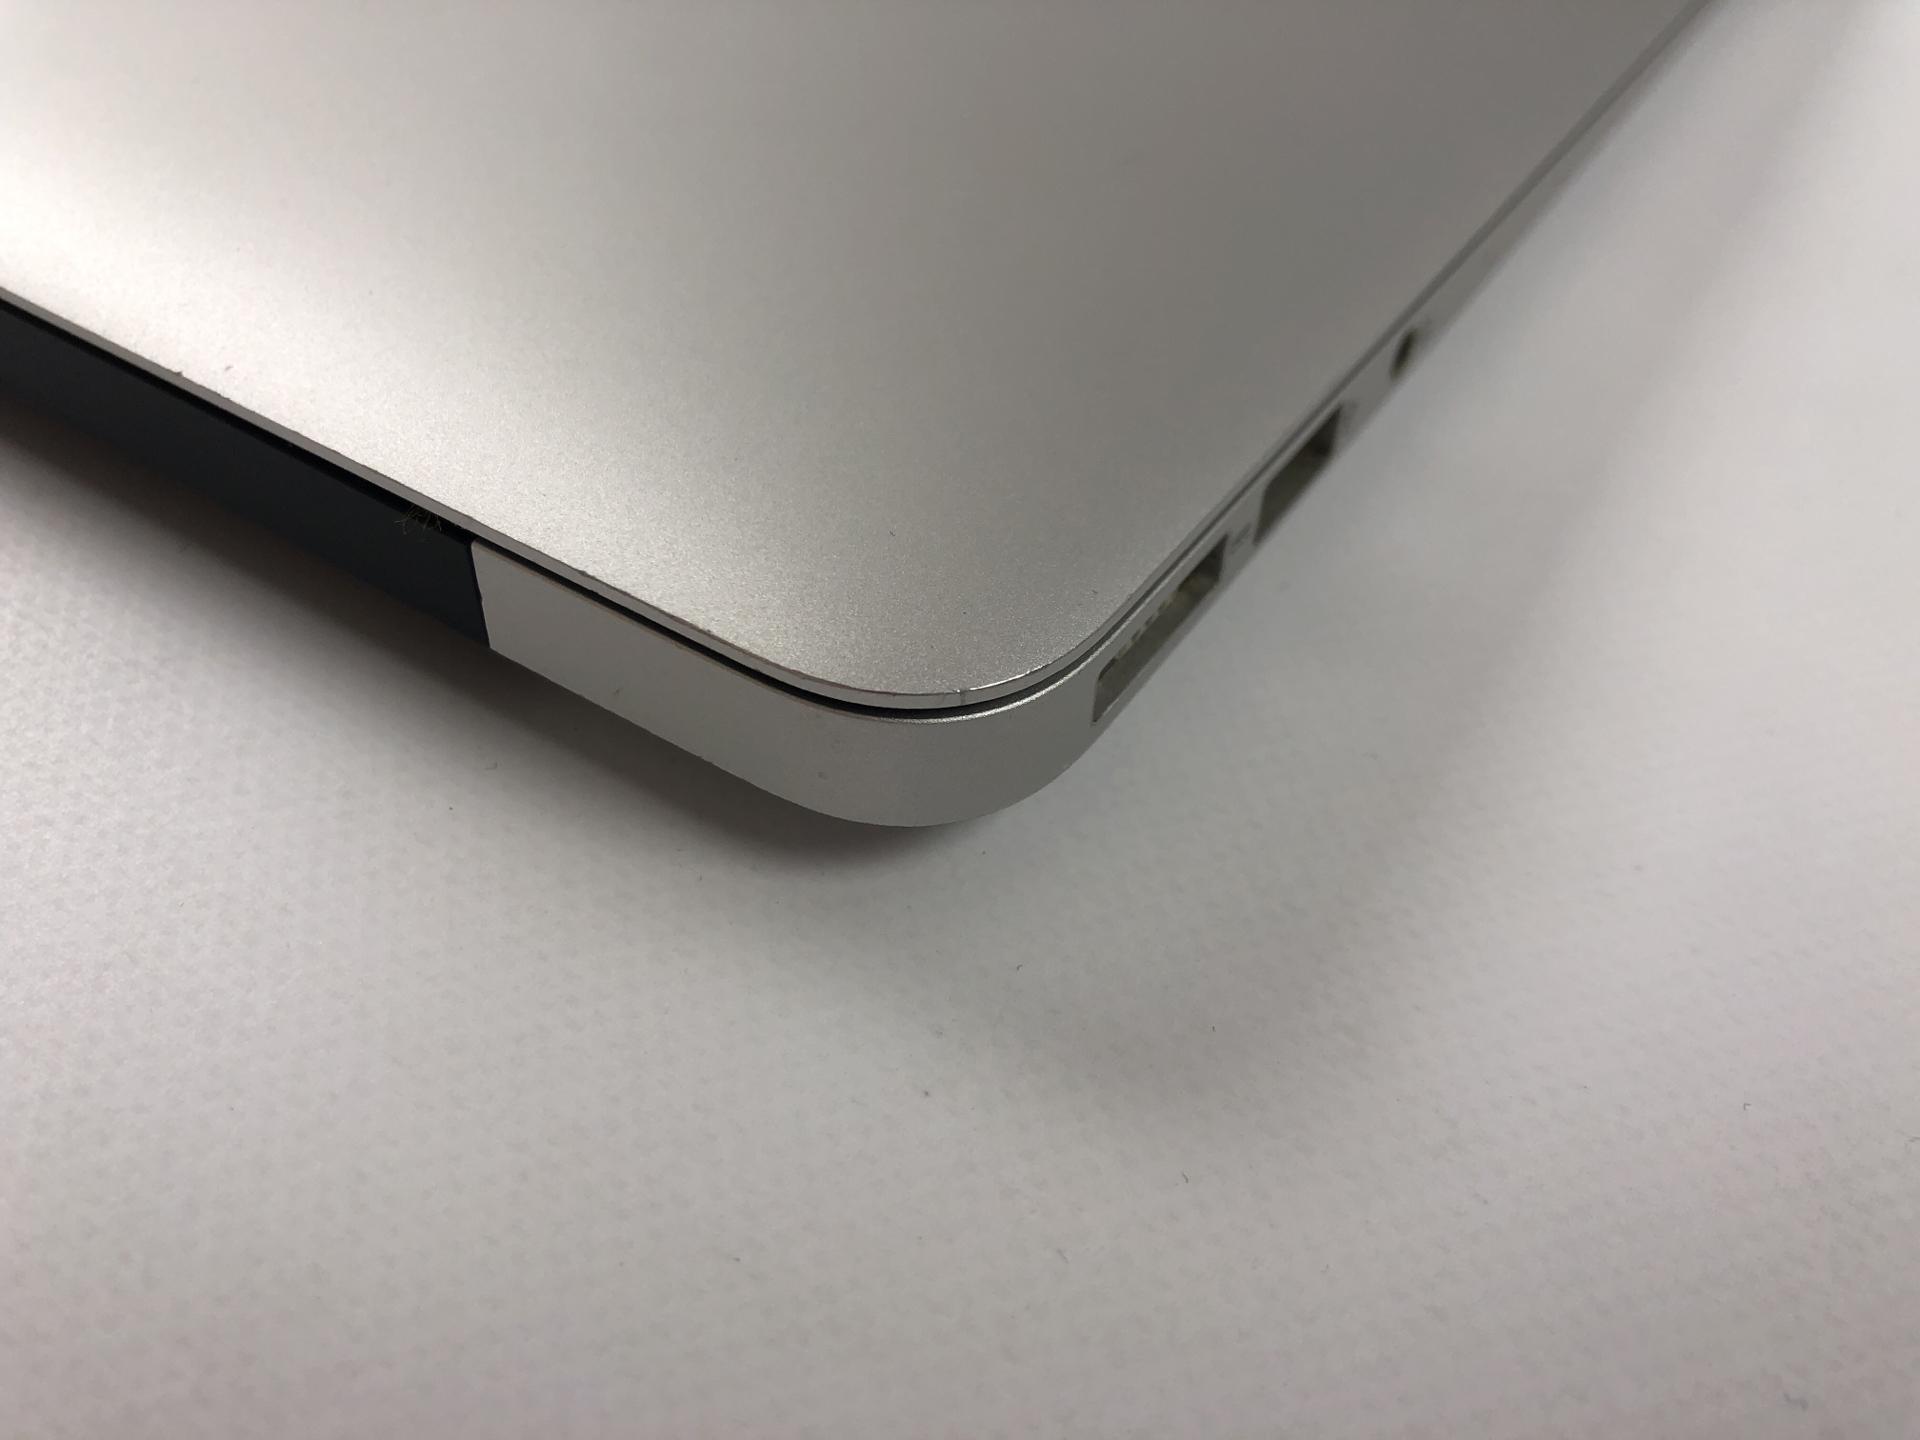 "MacBook Air 13"" Early 2015 (Intel Core i5 1.6 GHz 8 GB RAM 128 GB SSD), Intel Core i5 1.6 GHz, 8 GB RAM, 128 GB SSD, Afbeelding 5"